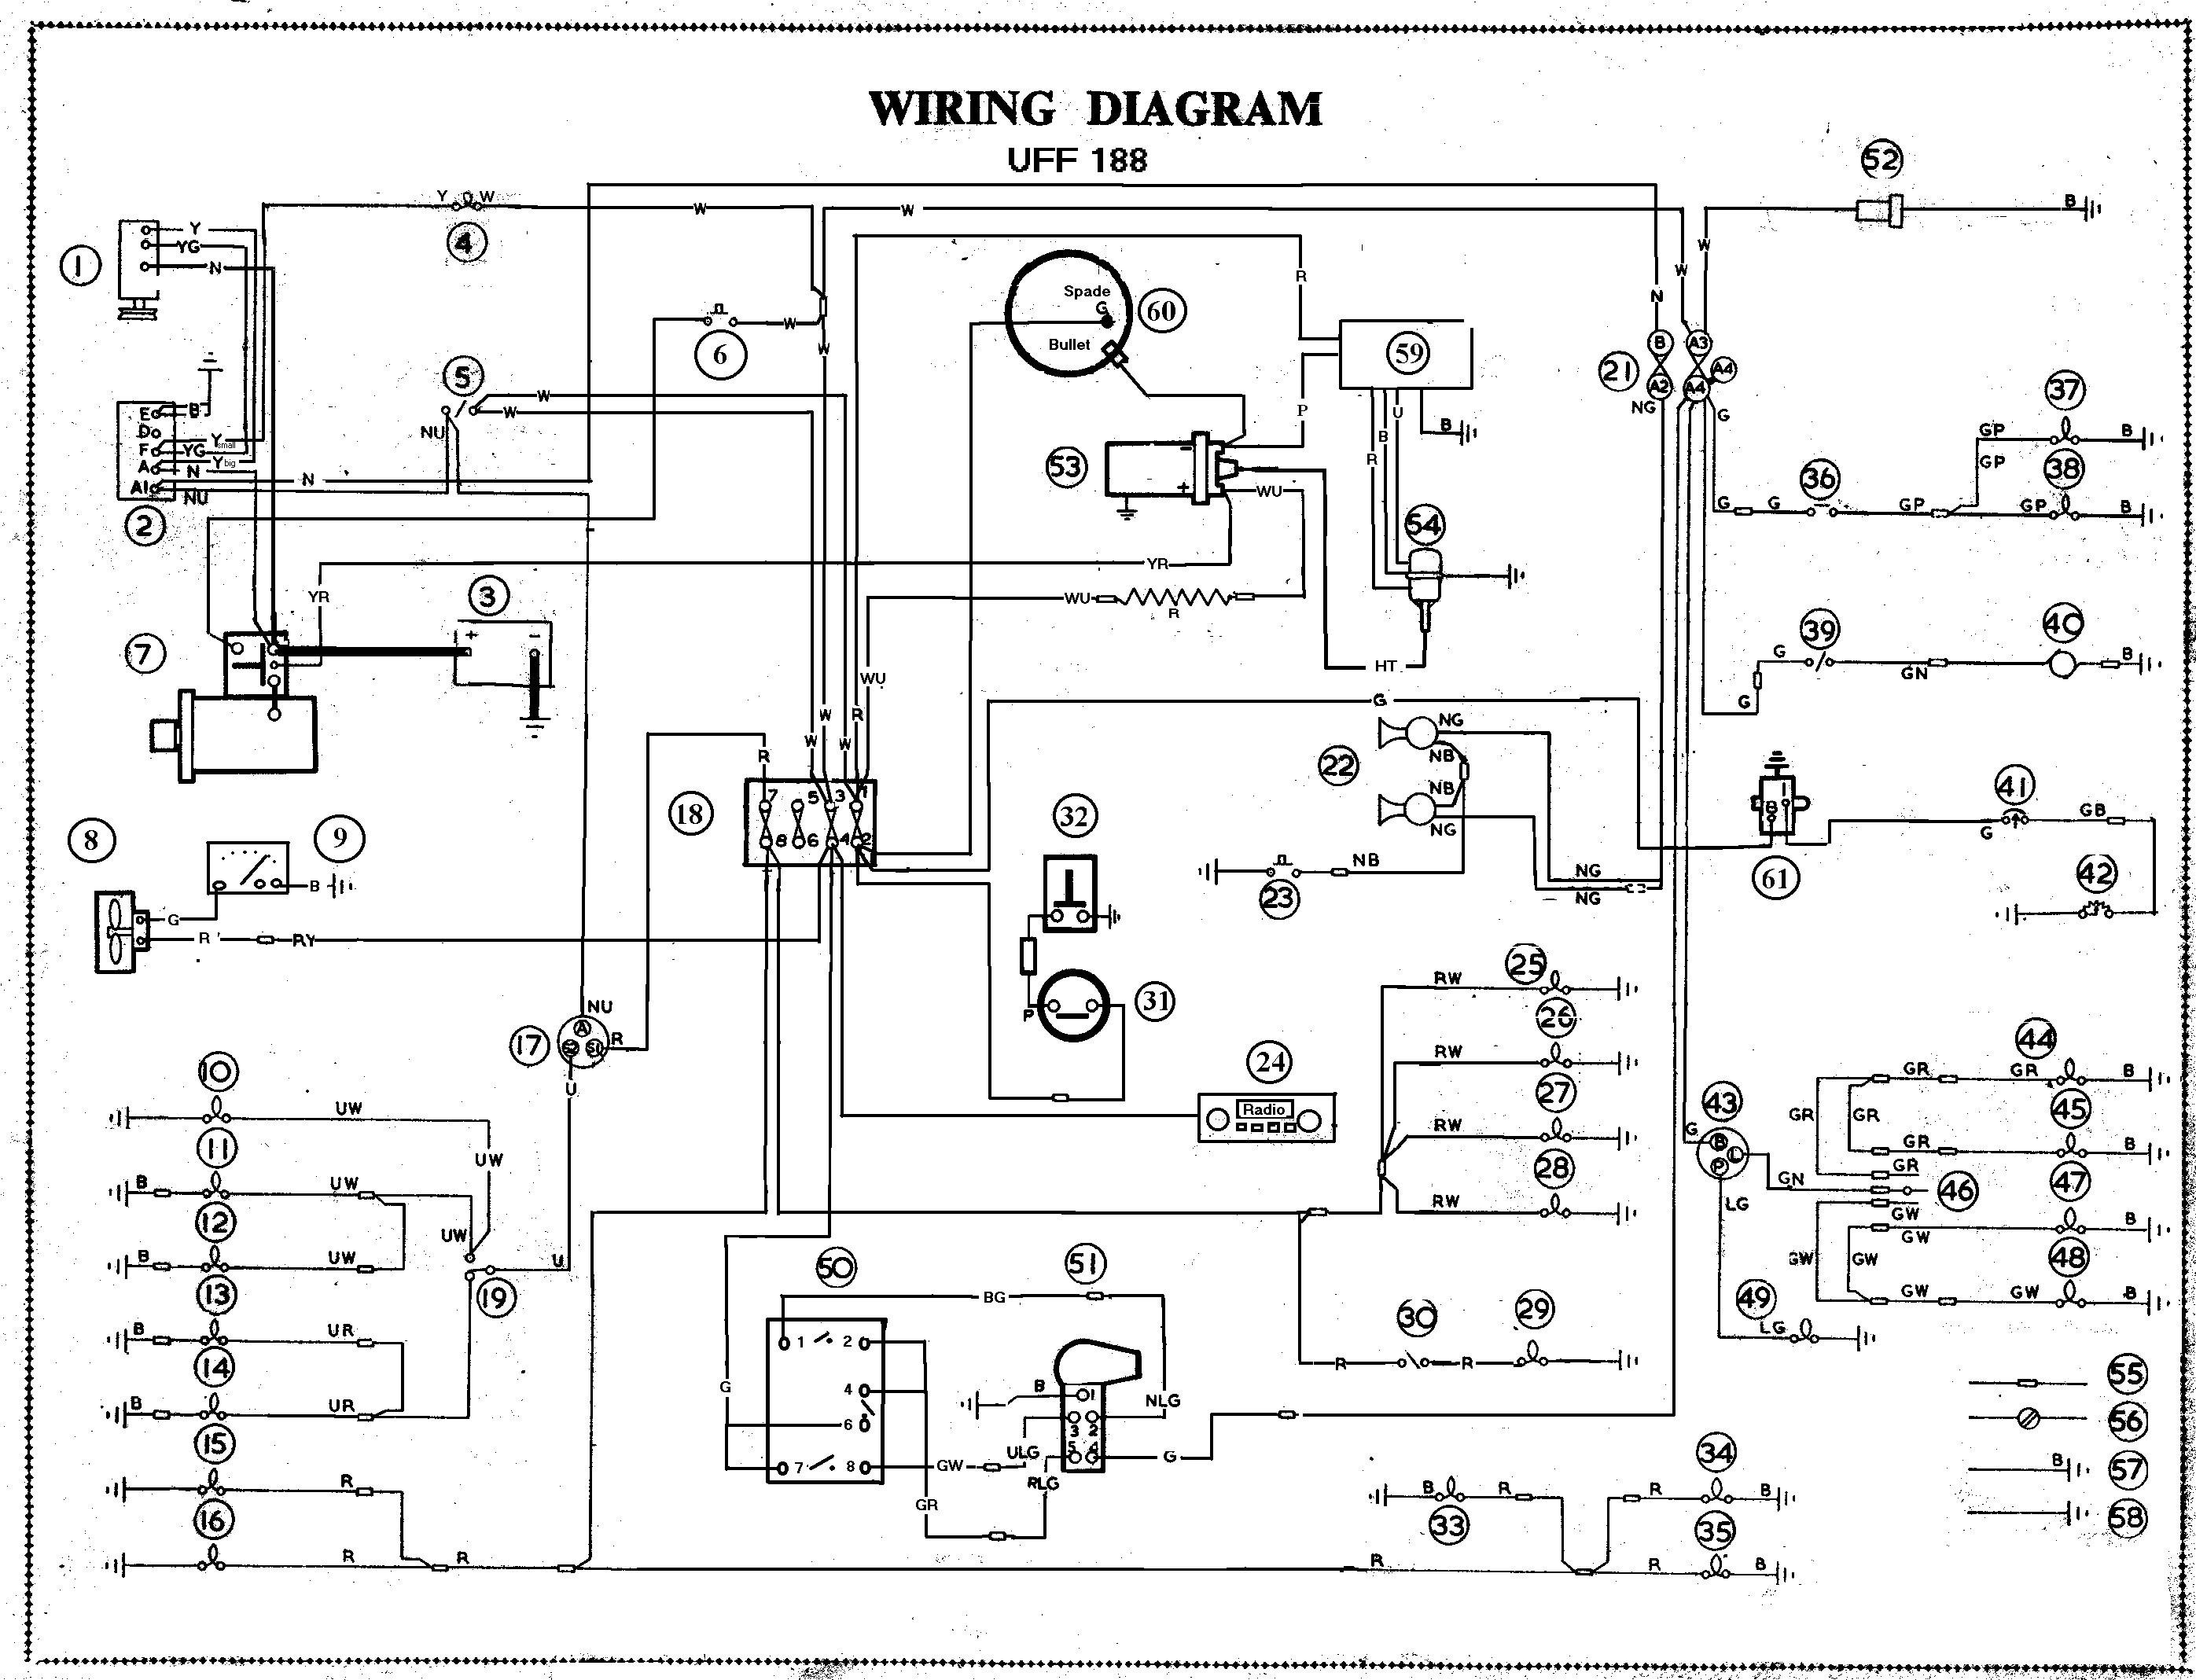 Automotive Air Conditioning System Diagram Car Electrical System Diagram Of Automotive Air Conditioning System Diagram